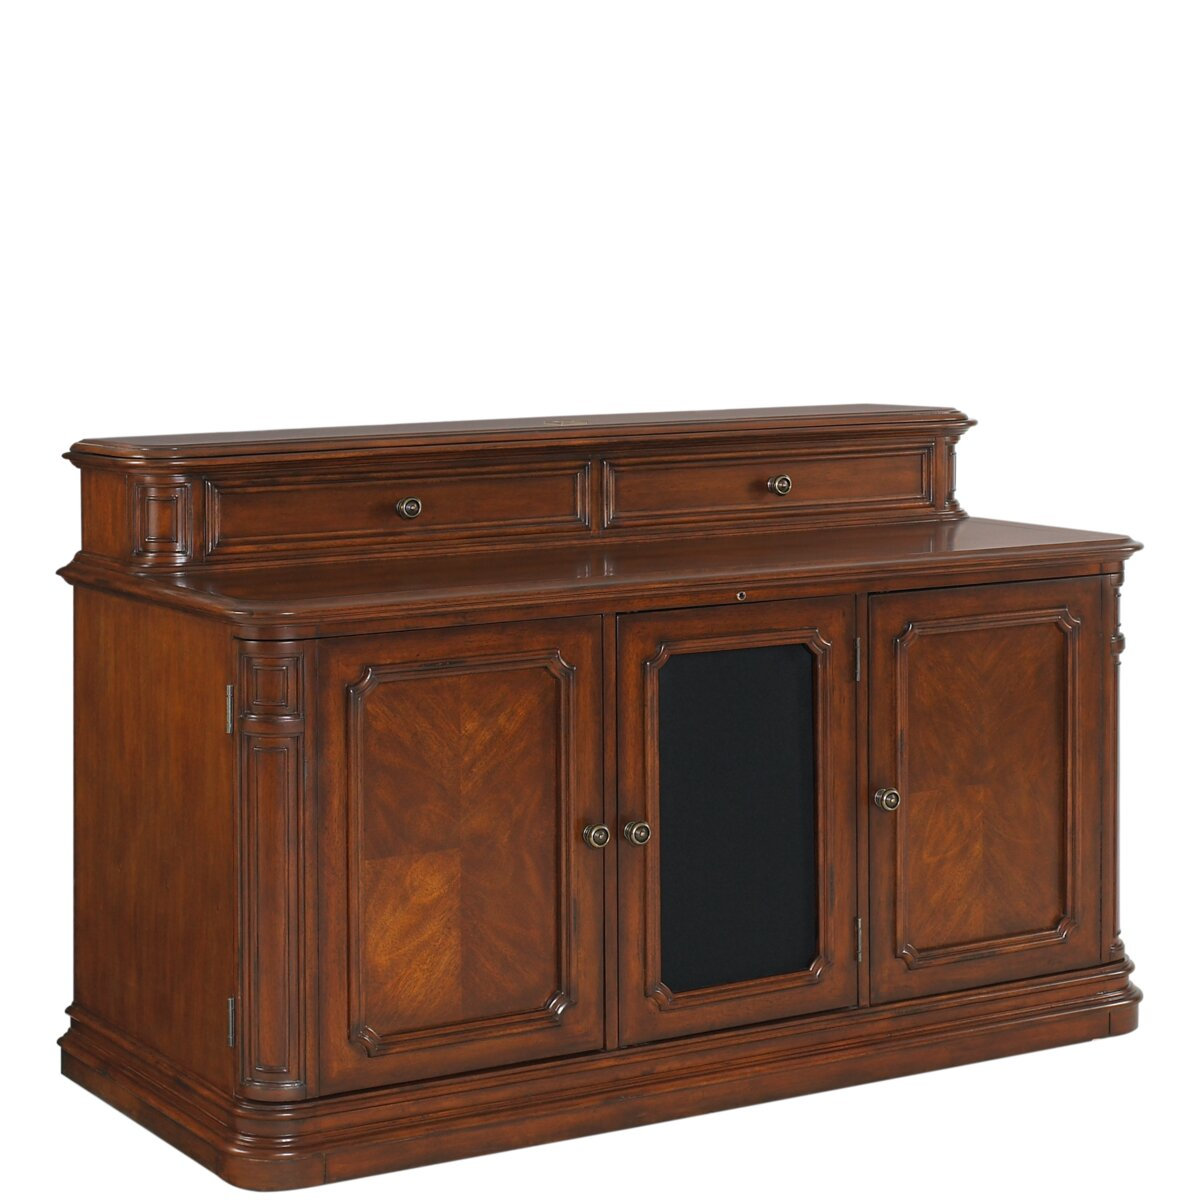 tvliftcabinet inc banyan creek tv stand reviews wayfair. Black Bedroom Furniture Sets. Home Design Ideas